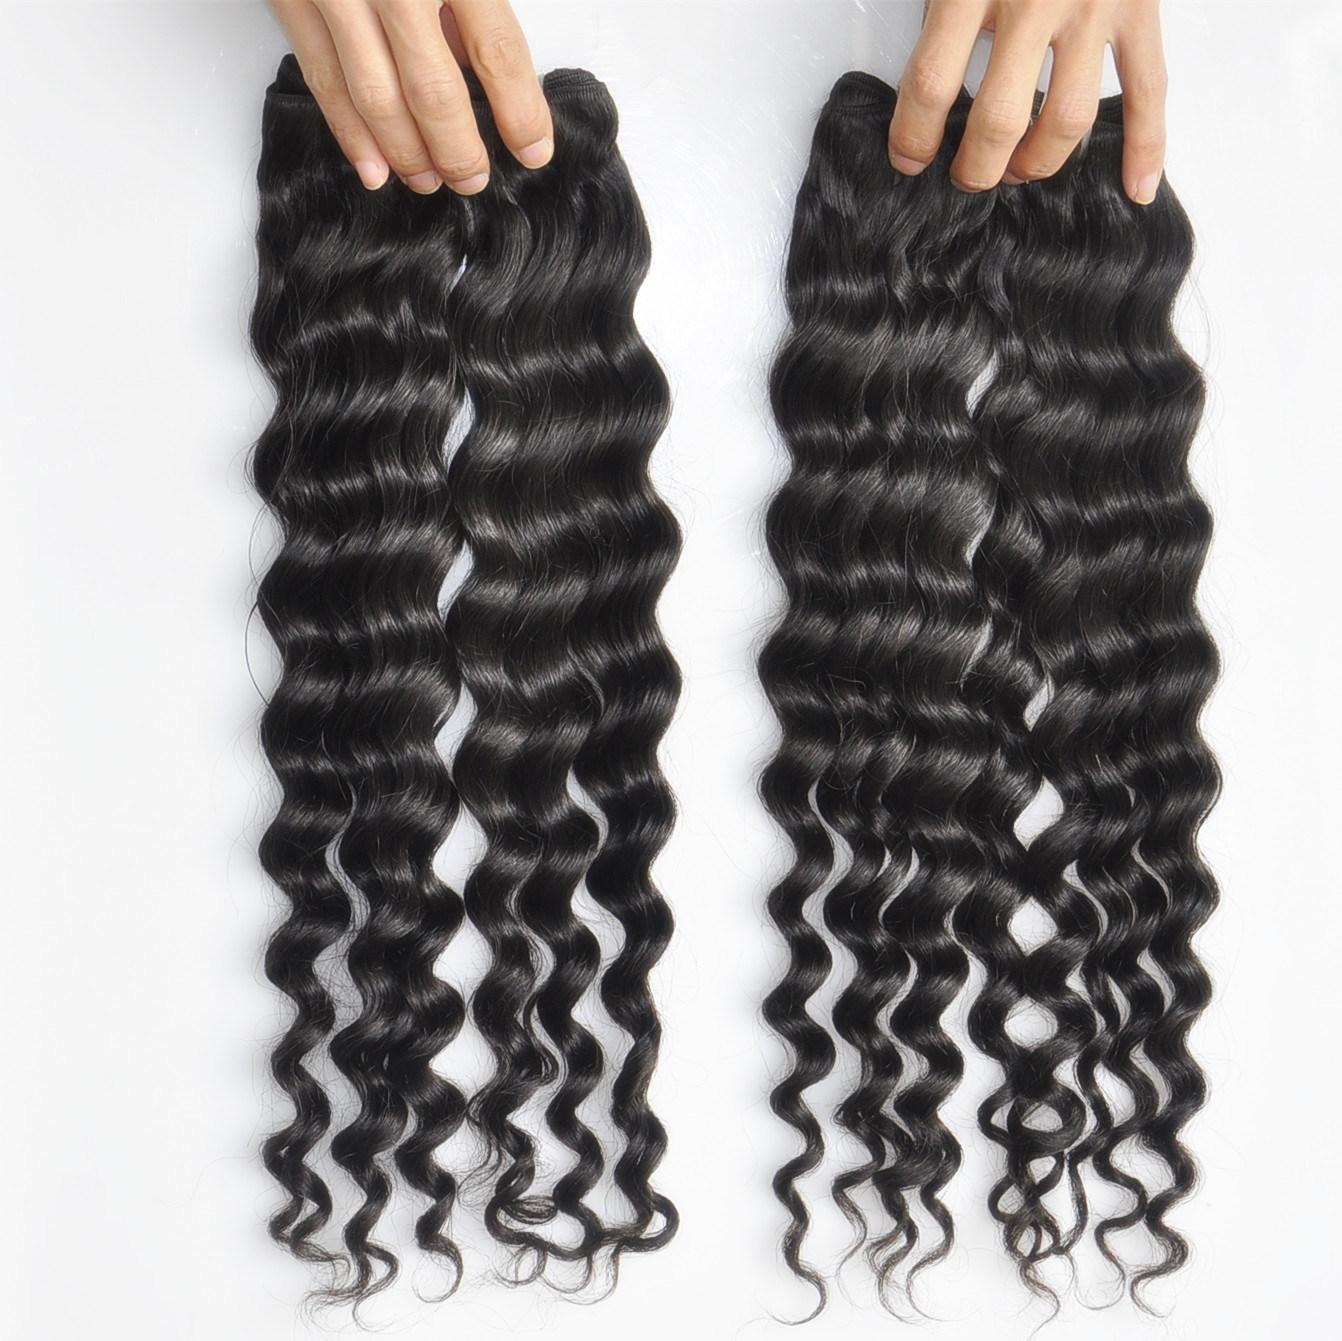 Labor Hair Products Brazilian Hair Weave Bundles Deep Wave Virgin Hair 105g/Piece Top Human Hair Weave Bundles